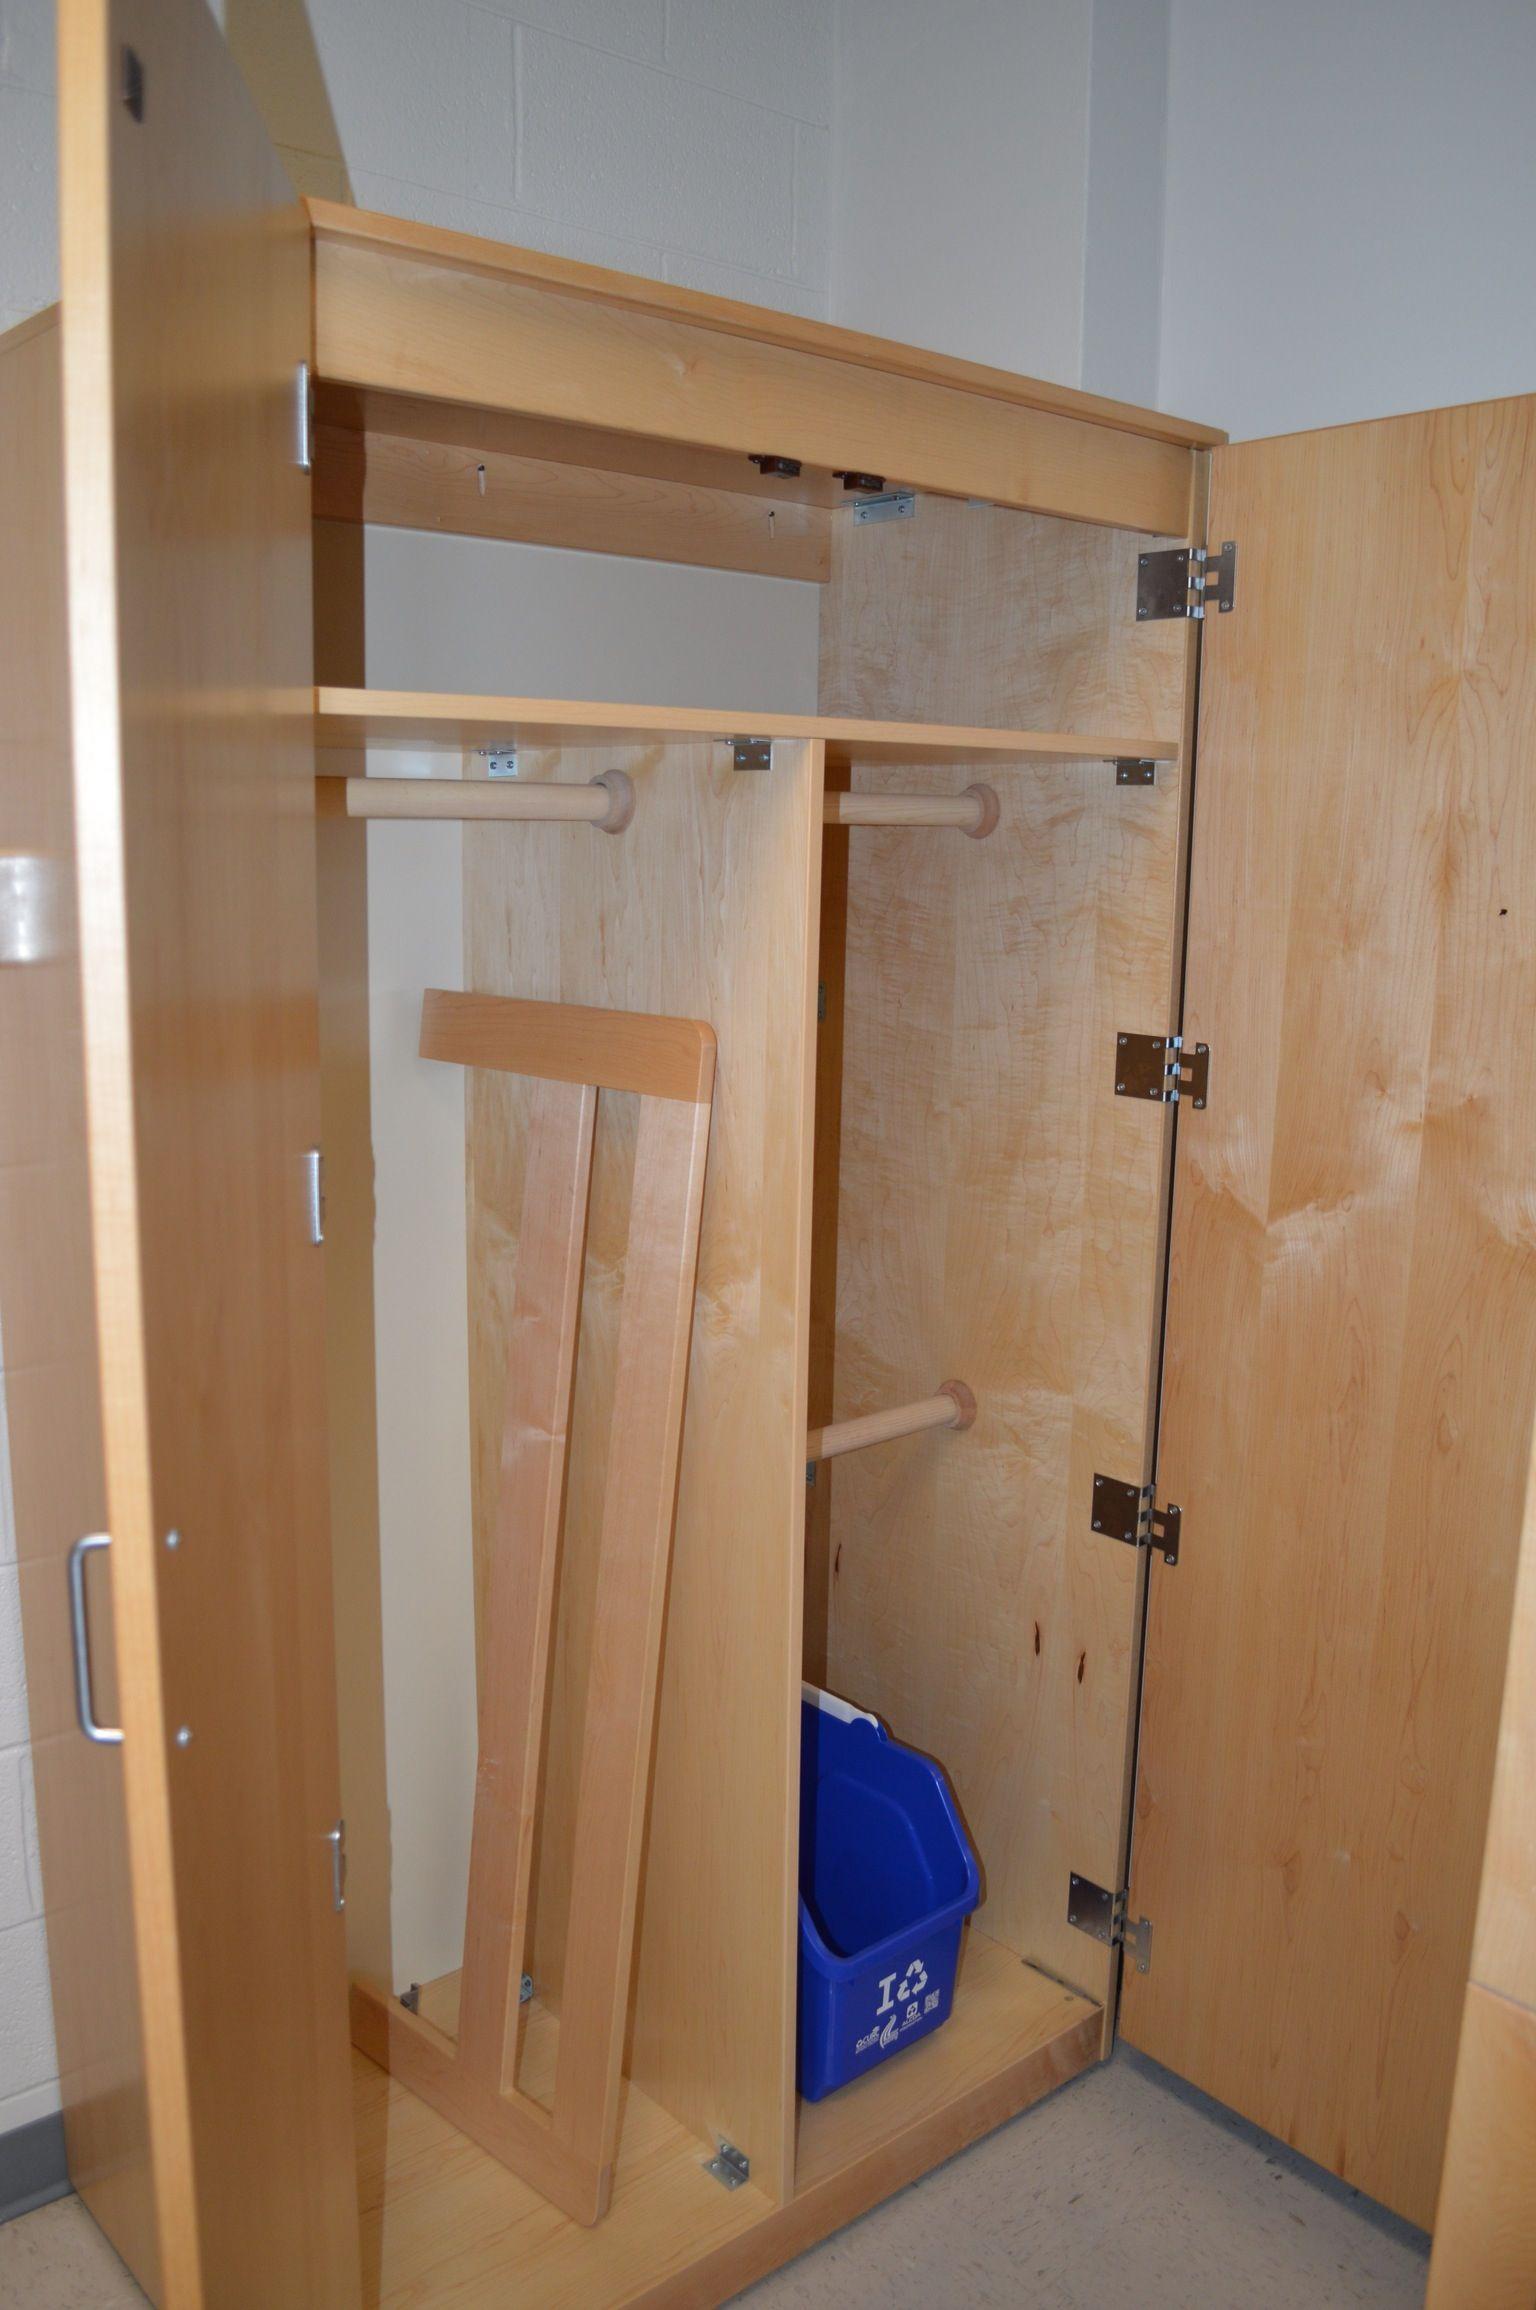 Dorm Room Closet: Hess Residence Hall Room Closet (1 Of 2 Closets In Room